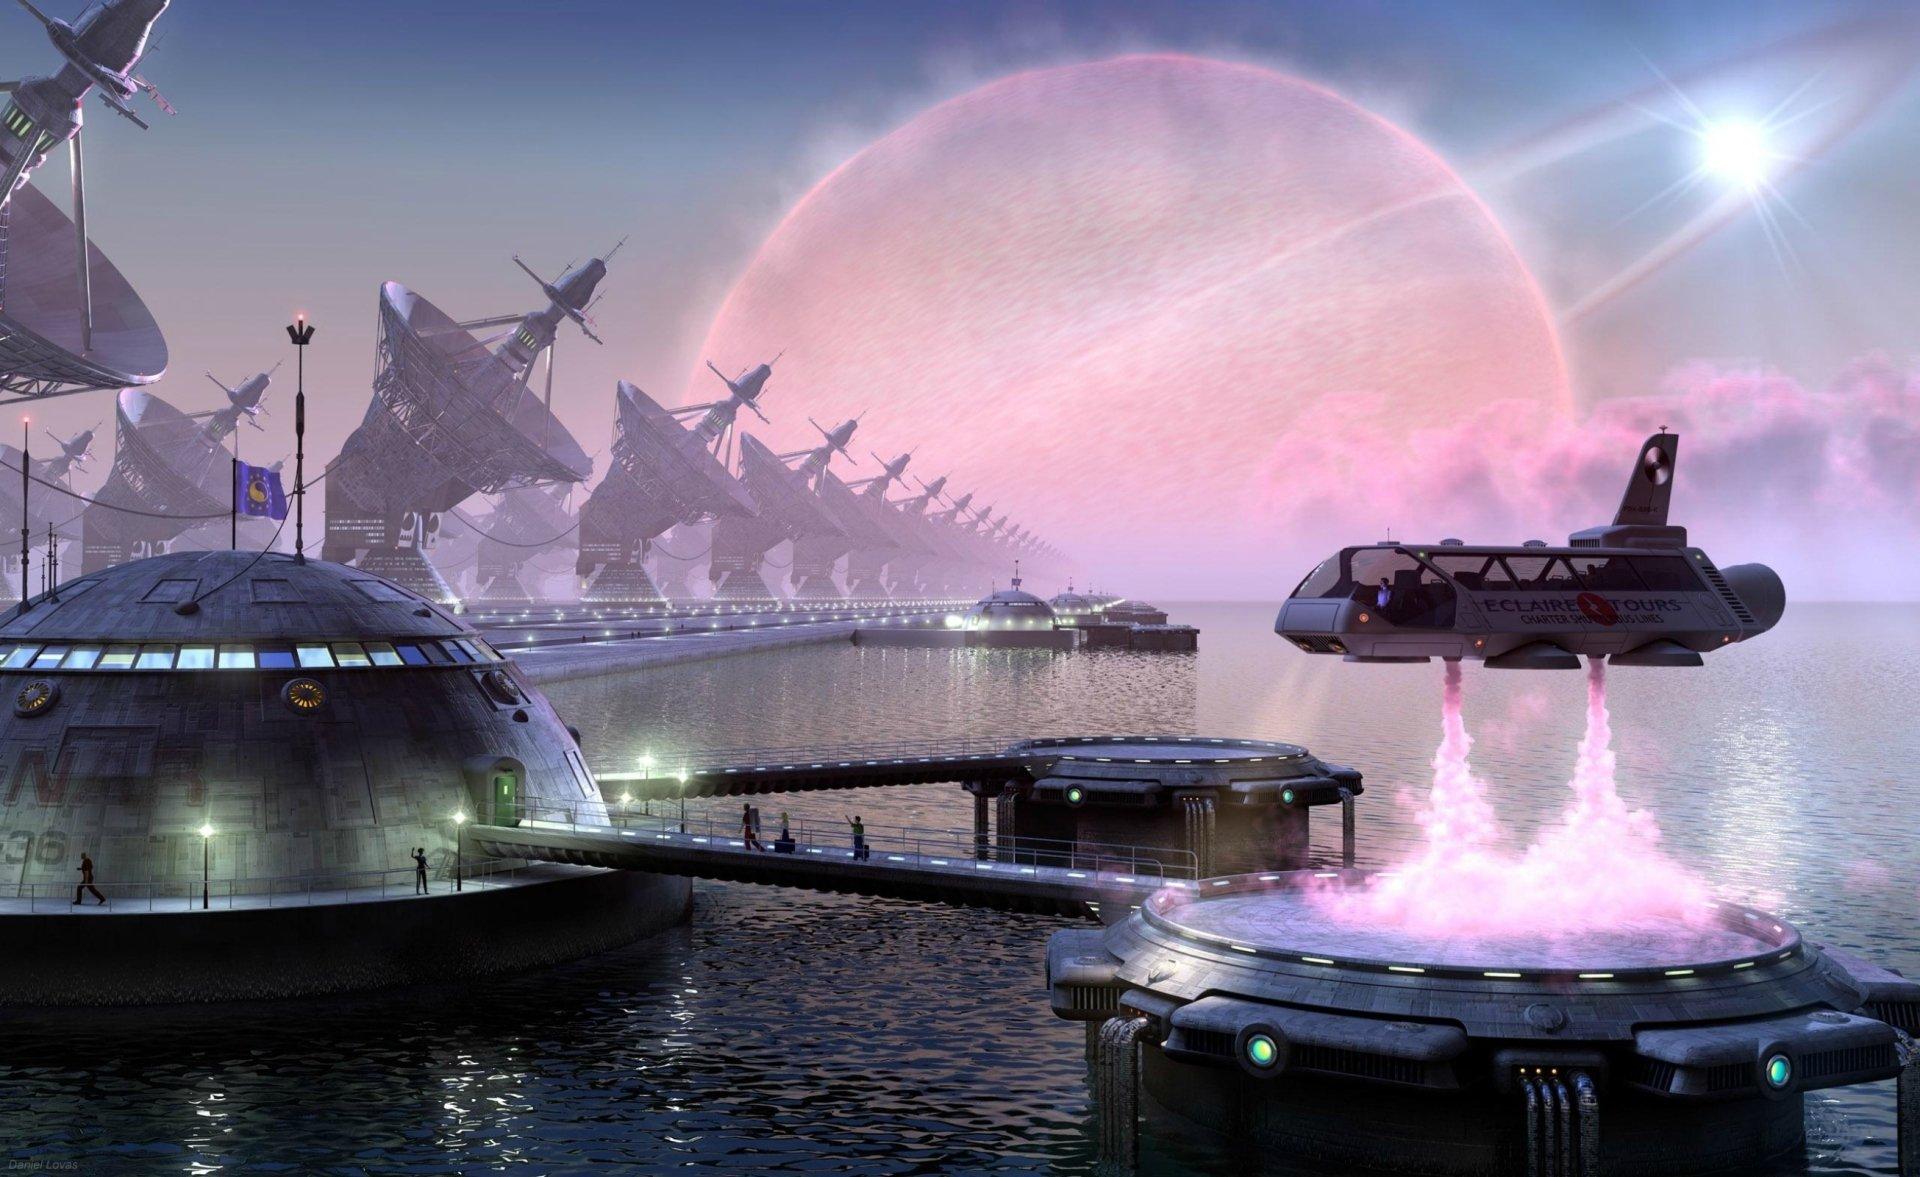 Sci Fi - Spaceport  Daniel Lovas Fantasy Wallpaper